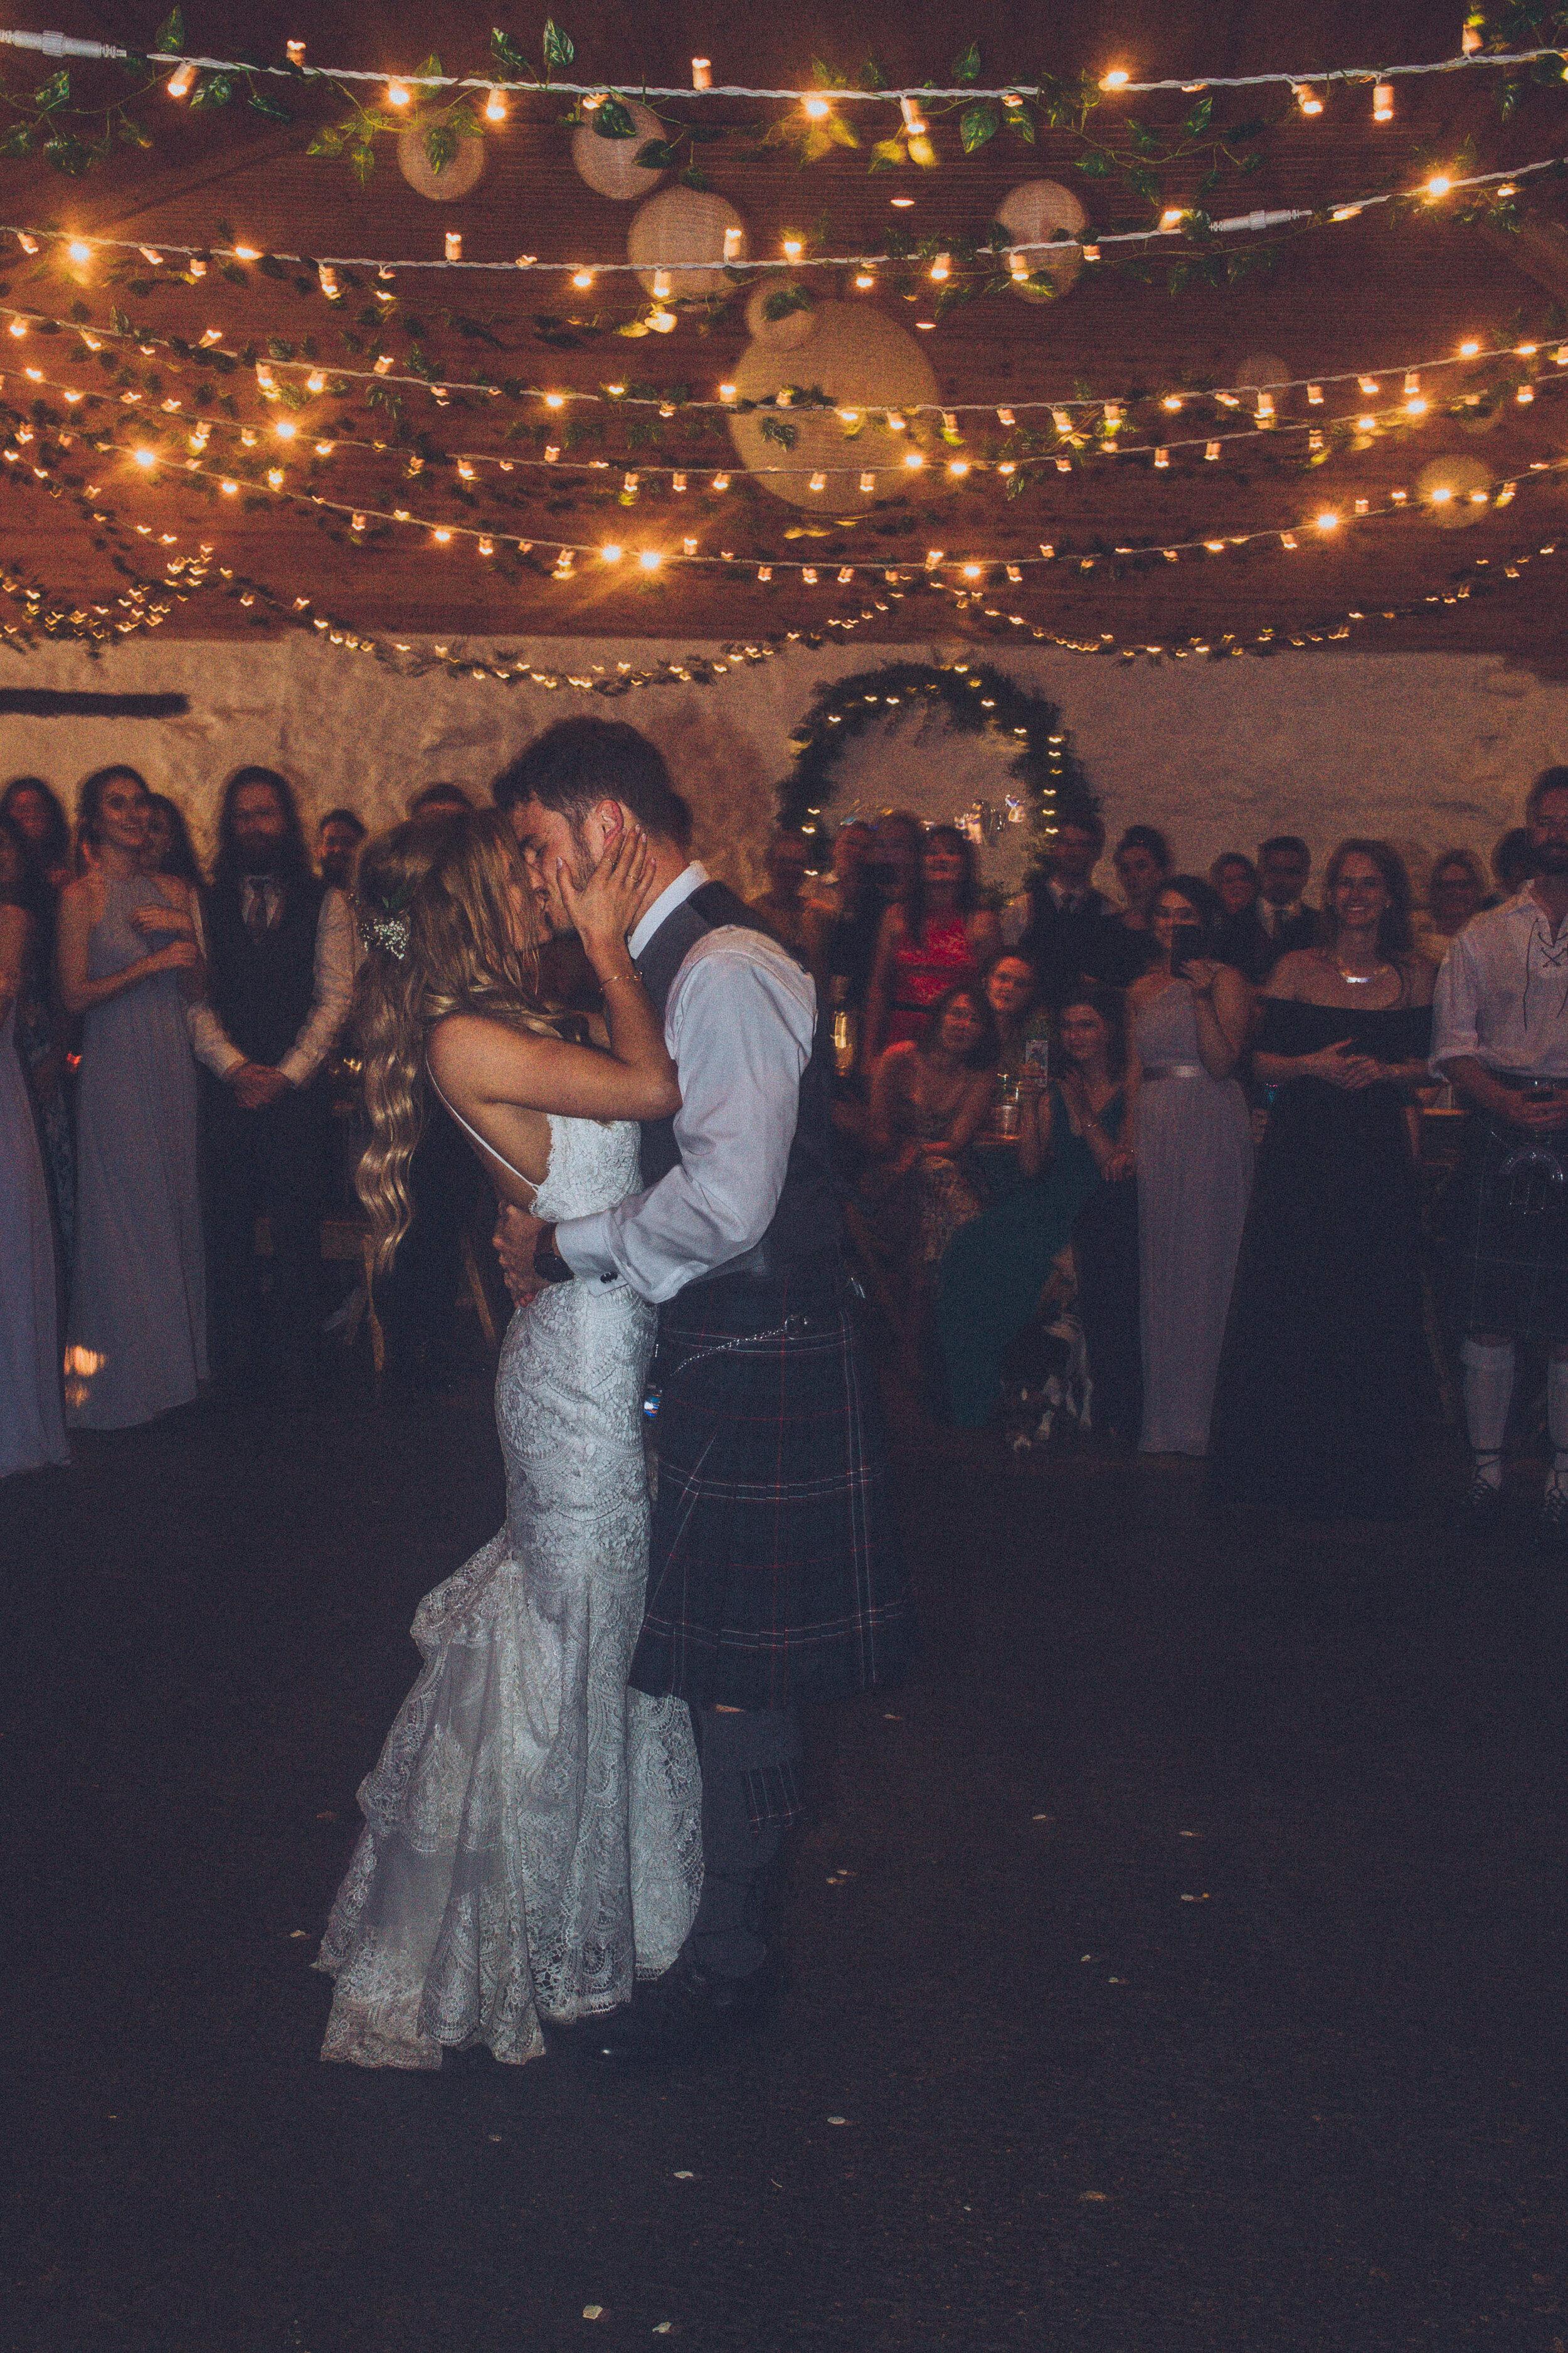 Dalduff Farm Ayrshire Wedding Photography - Claire Basiuk Photographer - 27.jpg